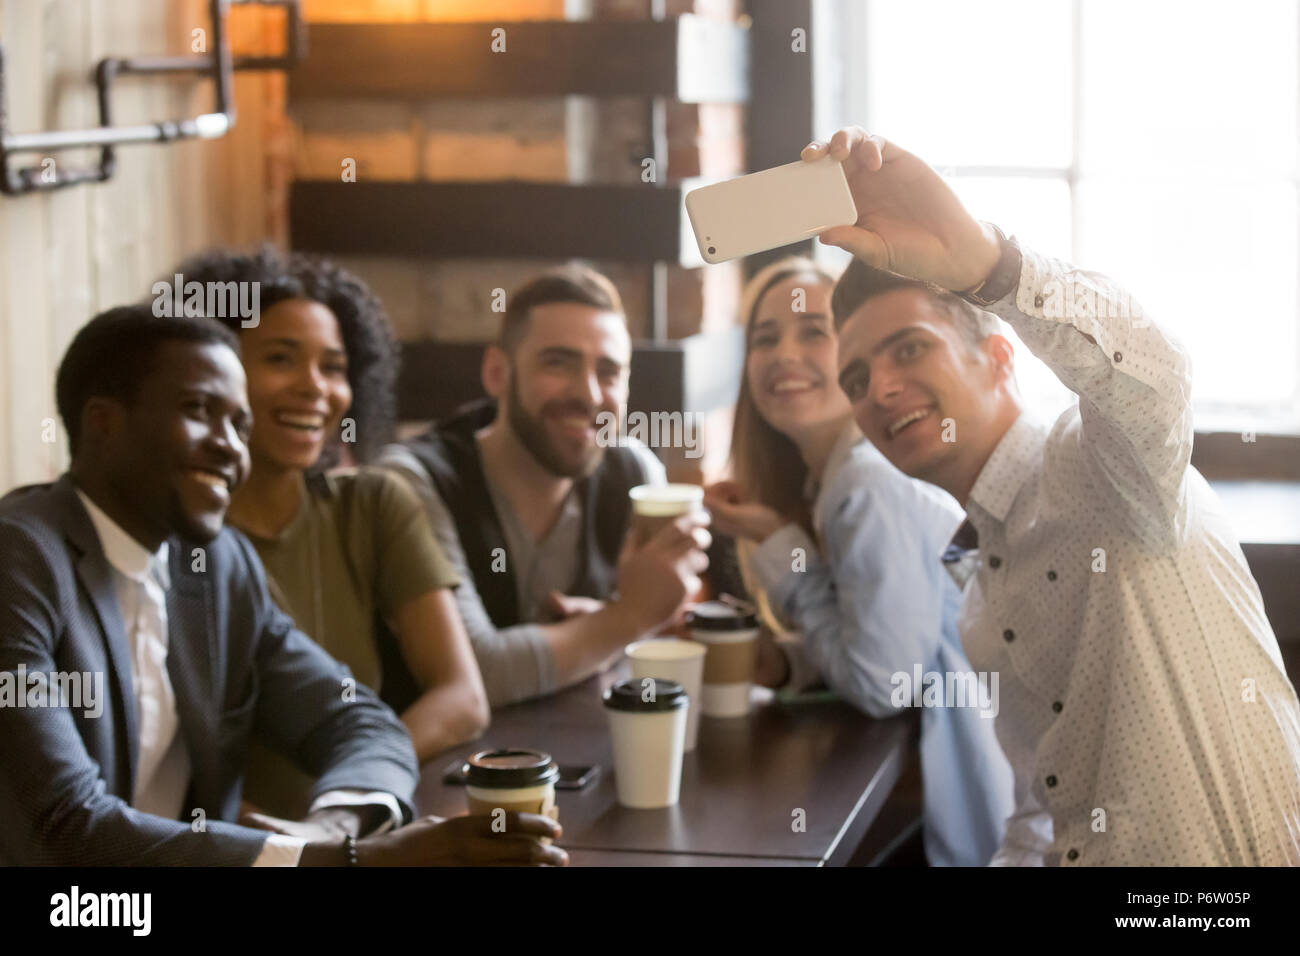 Millennial friends having fun making selfie in cafe - Stock Image